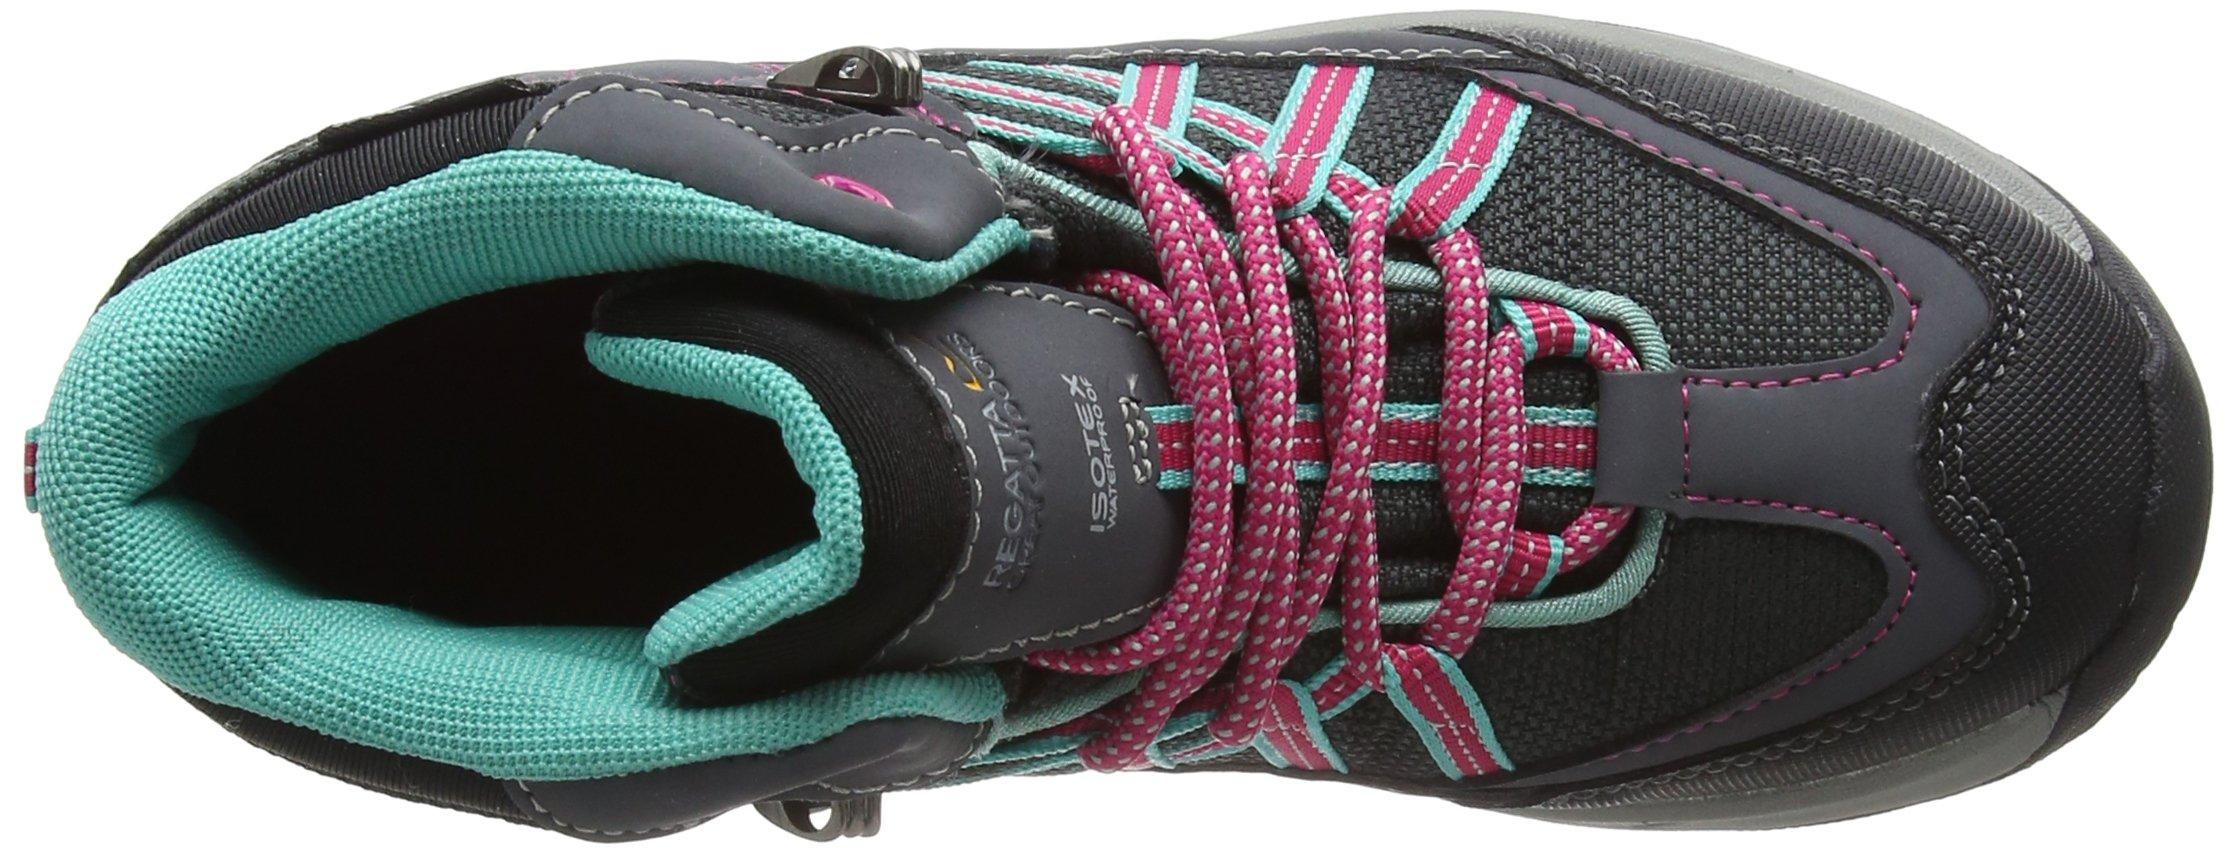 Regatta Samaris Mid Jnr, Girls' High Rise Hiking Boots 7